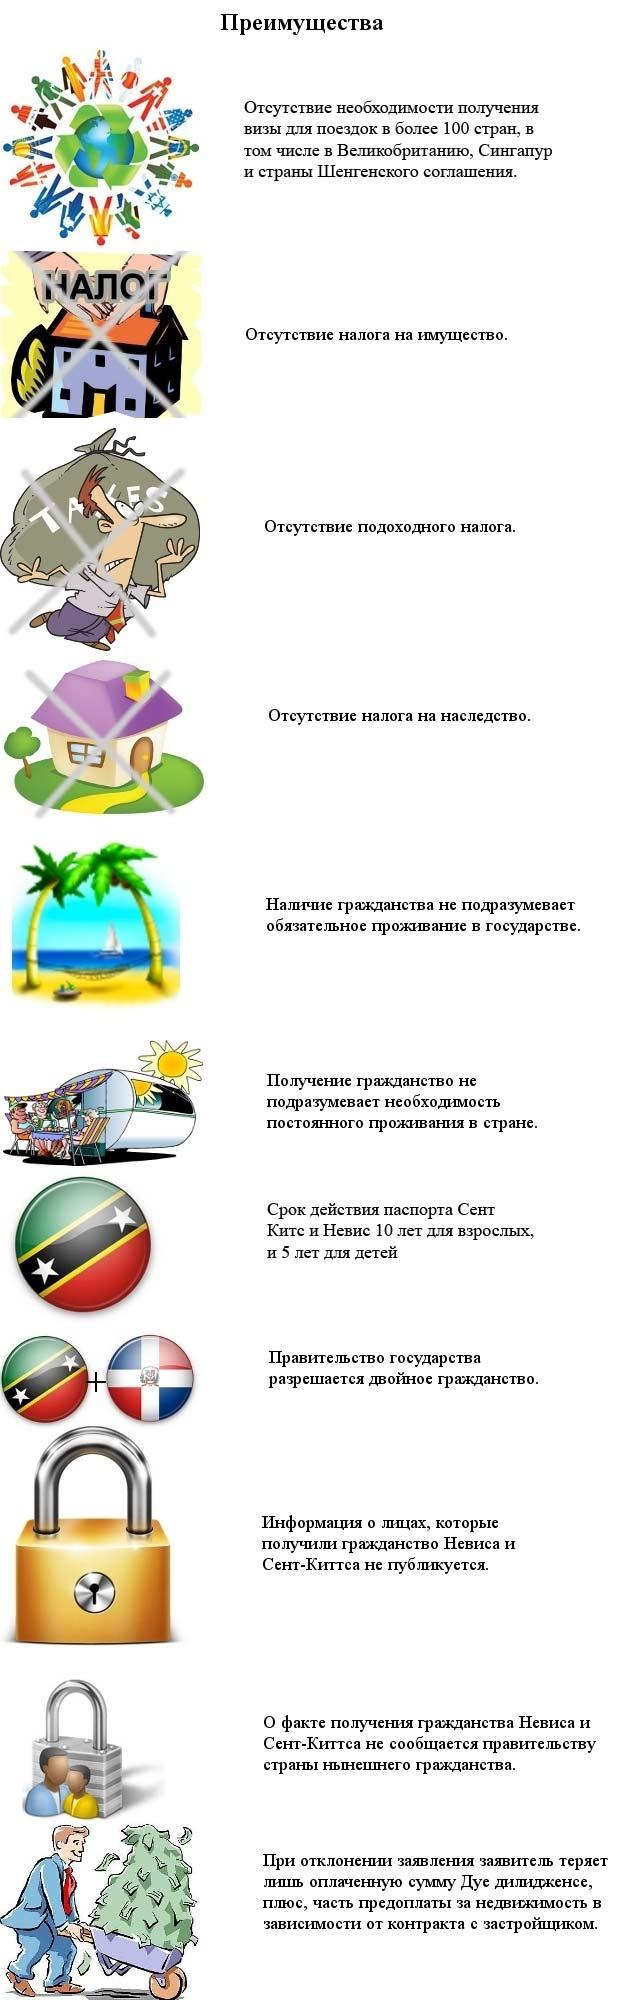 преимущества гражданства Невис